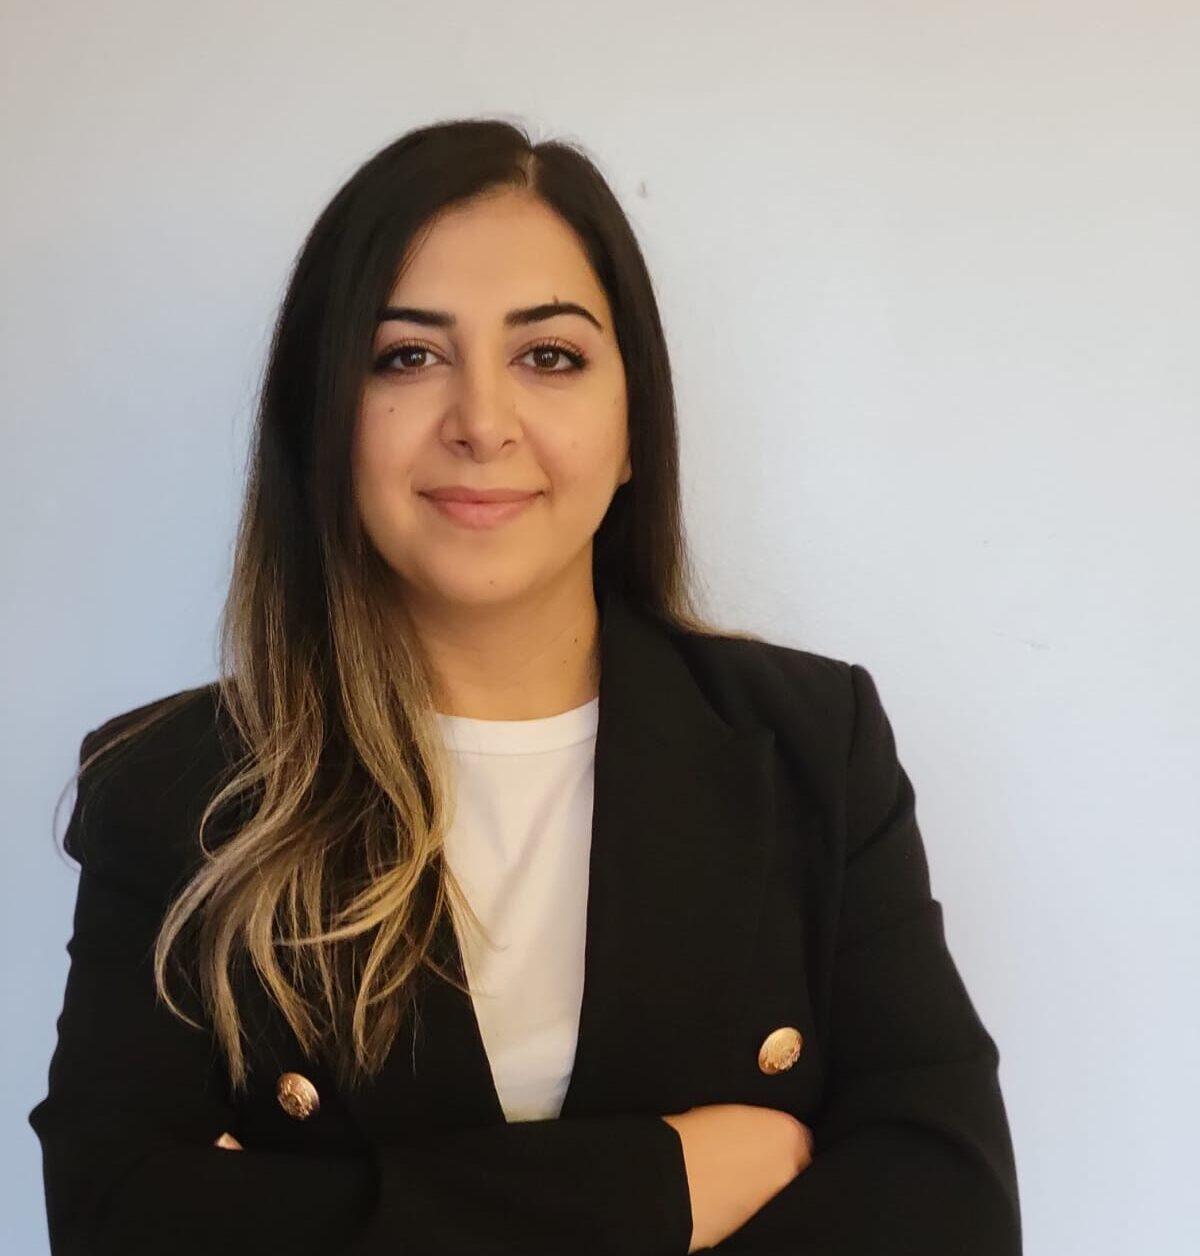 Yara Misselmany